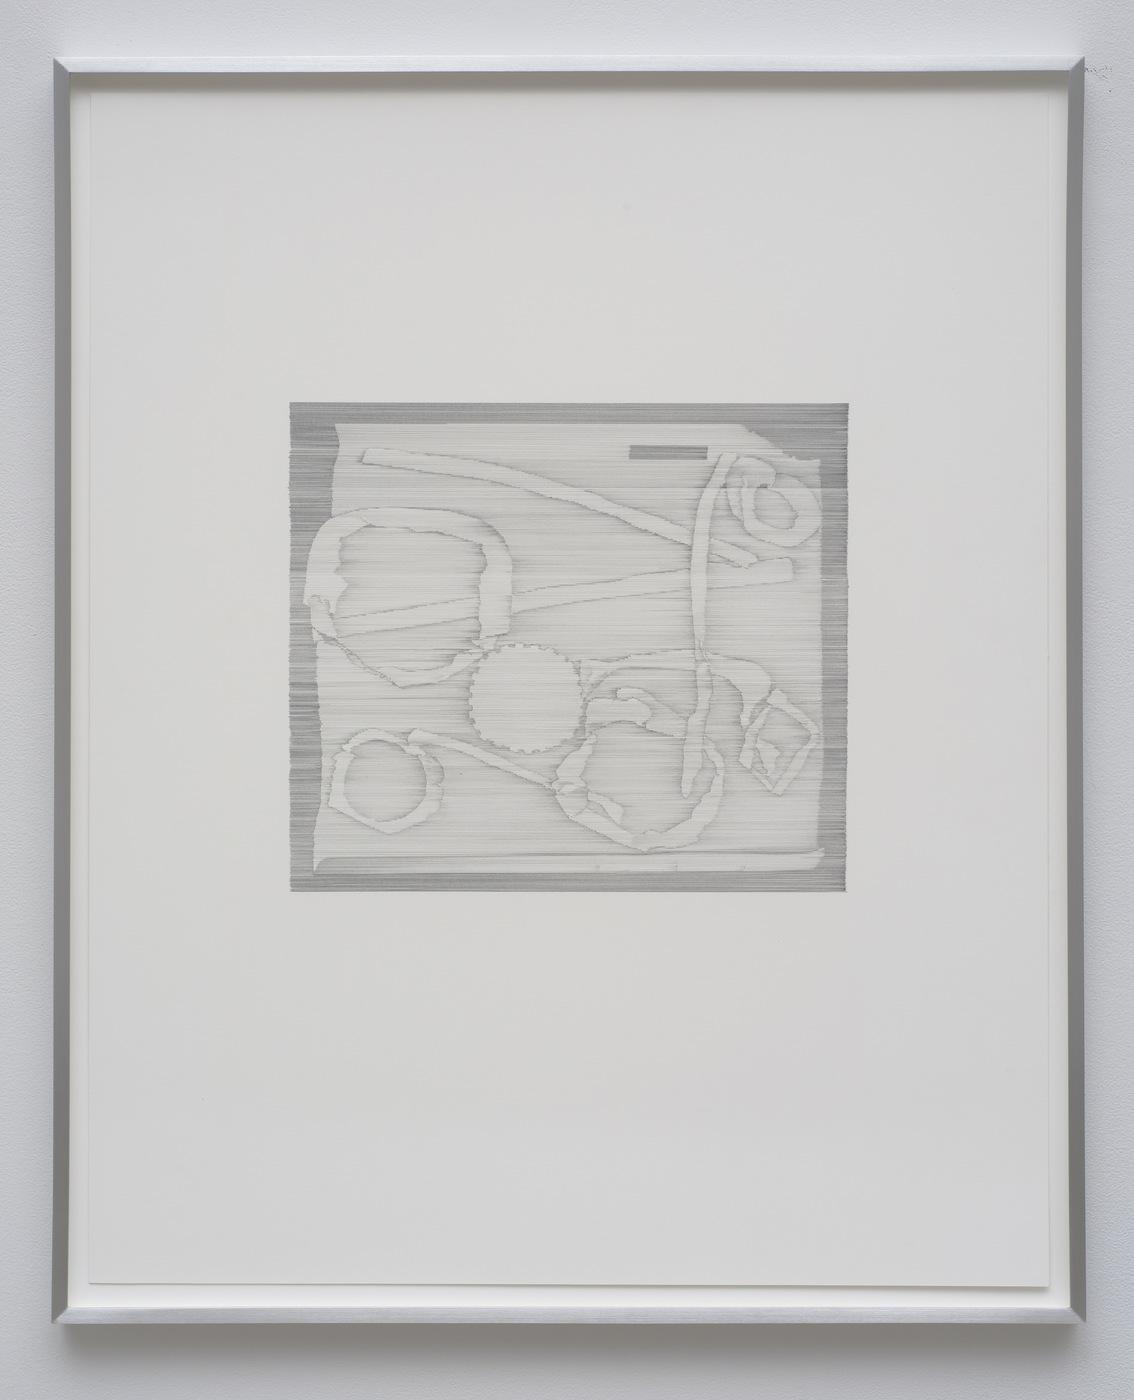 dm_2014_Machine drawing no. 3_framed